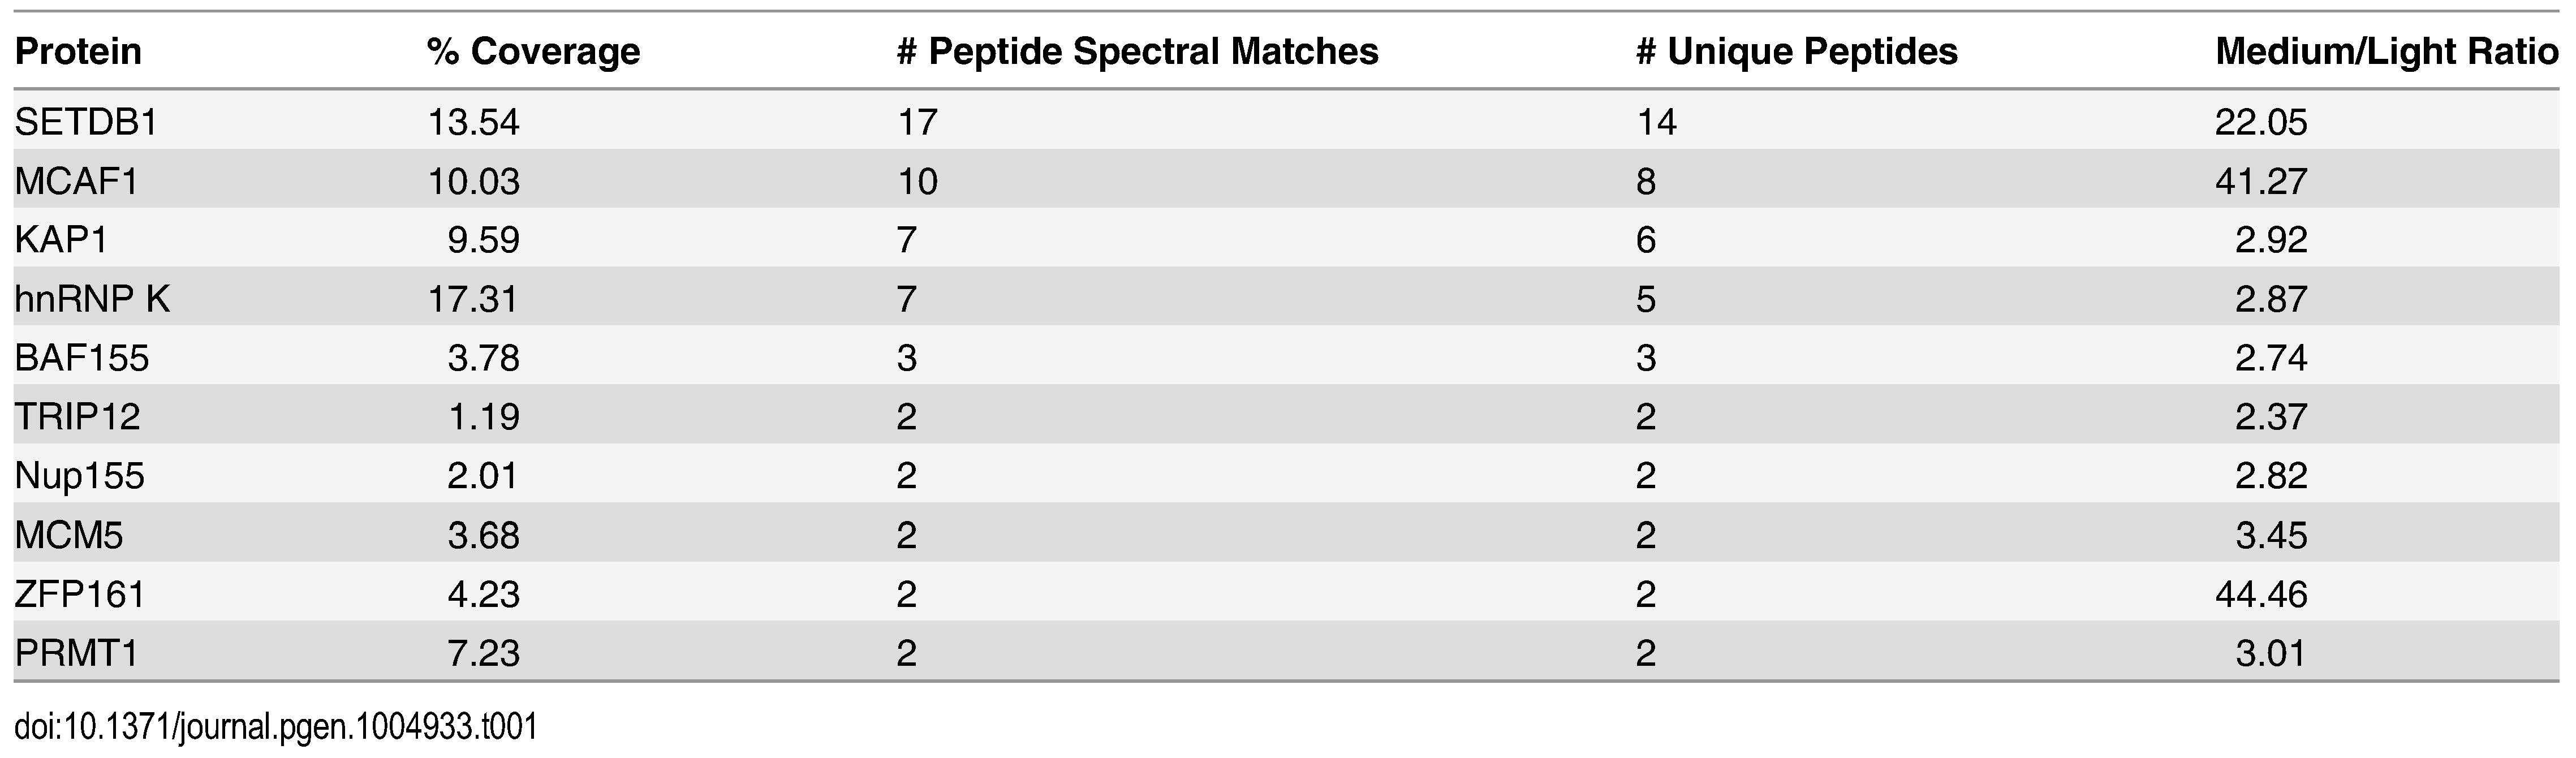 Mass spectrometric analysis of SETDB1 (medium) versus IgG (light) IPs from the 0.5 M anionic column fraction.